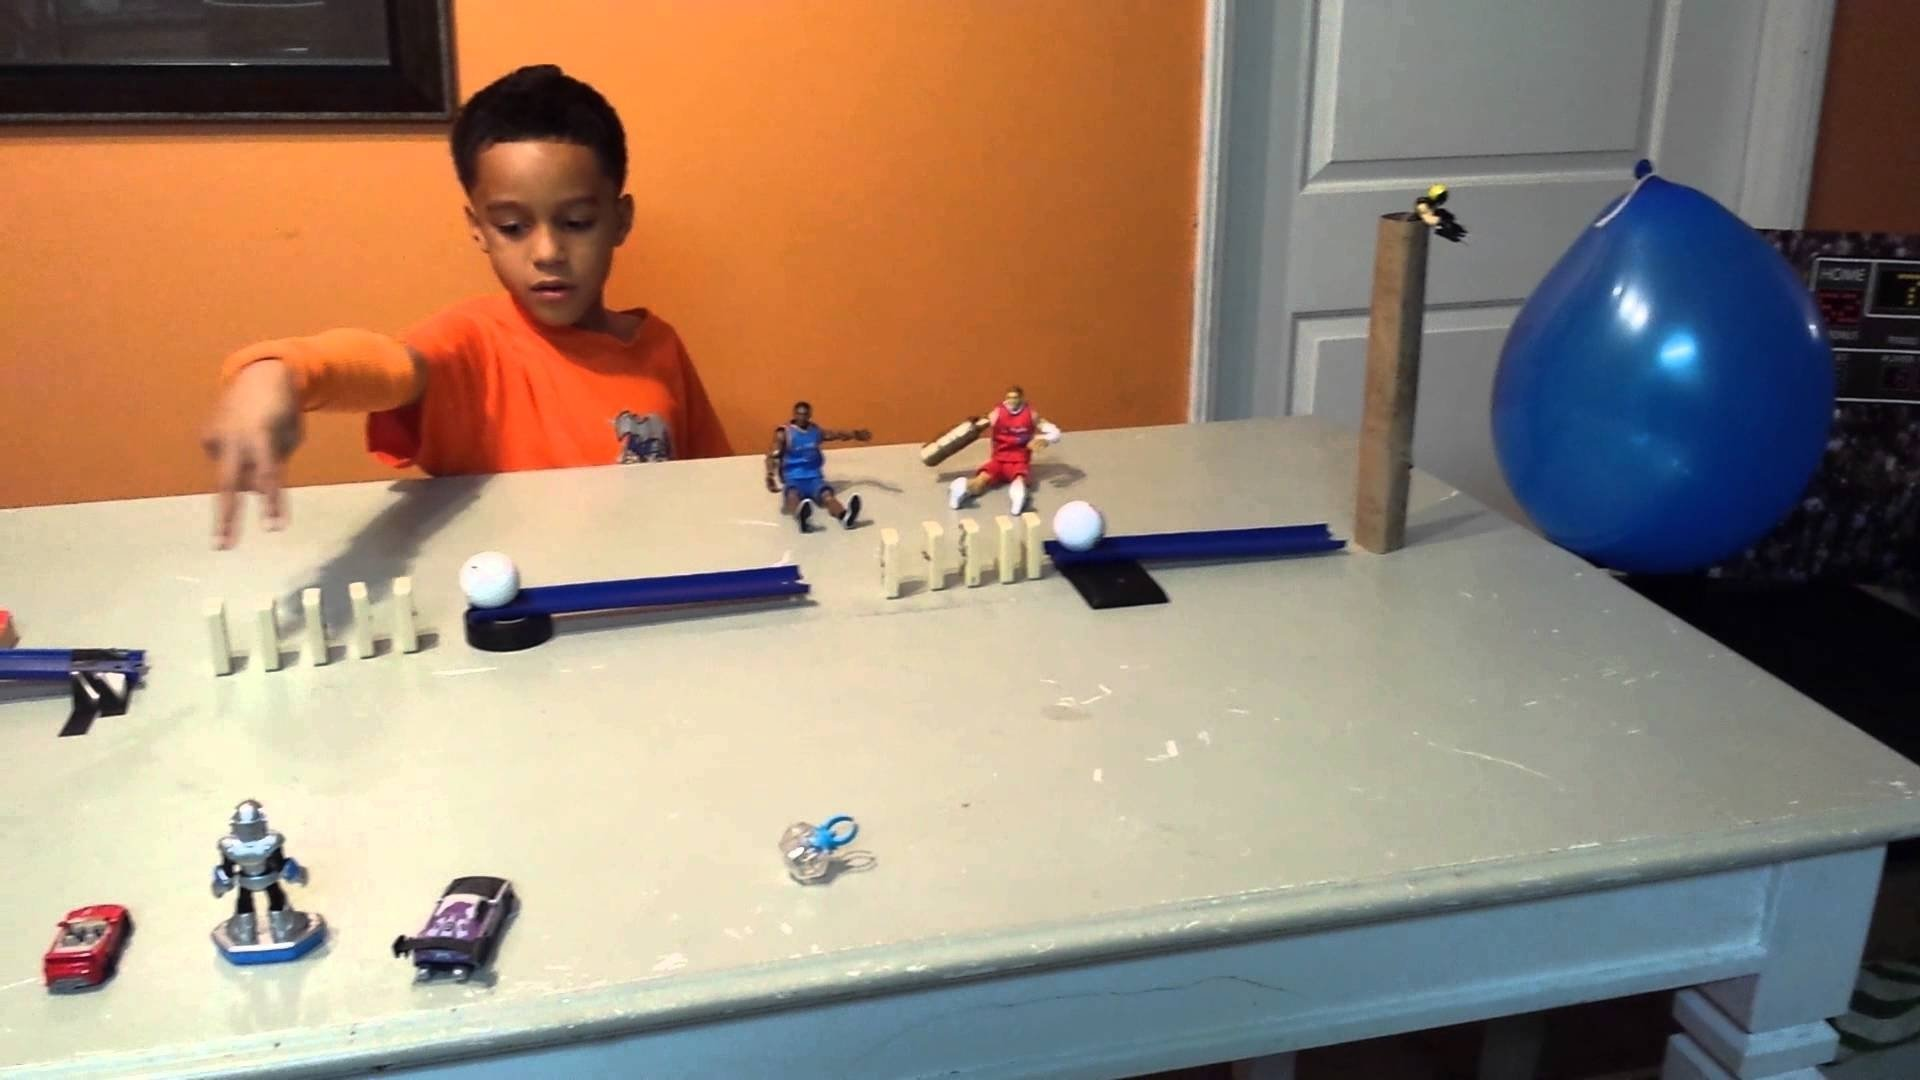 10 Lovely Ideas For A Rube Goldberg Machine rube goldberg machine pop a balloon youtube 1 2020